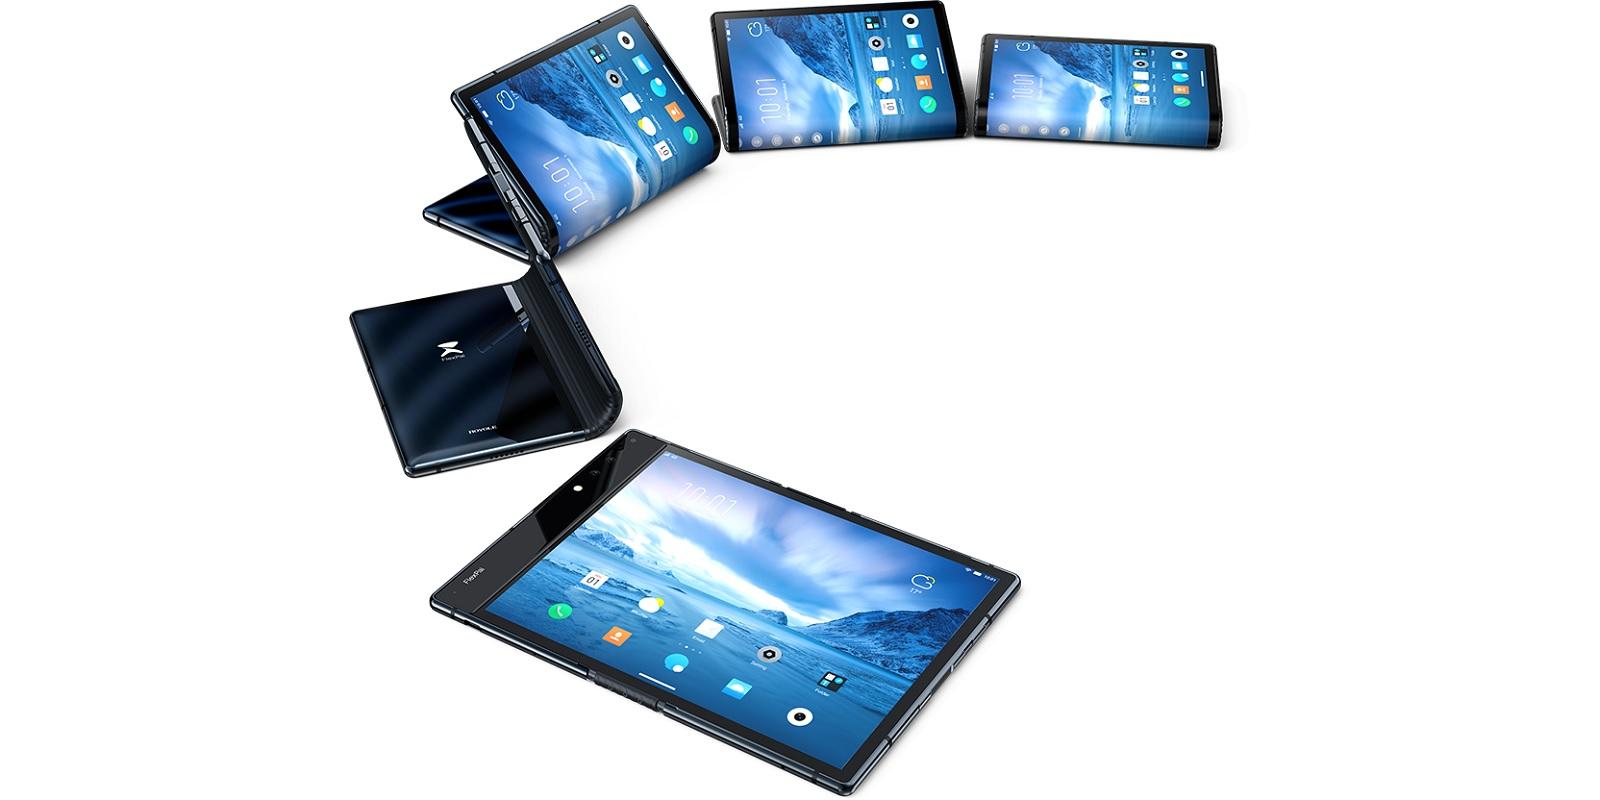 składany smartfon Royole FlexPai foldable smartphone